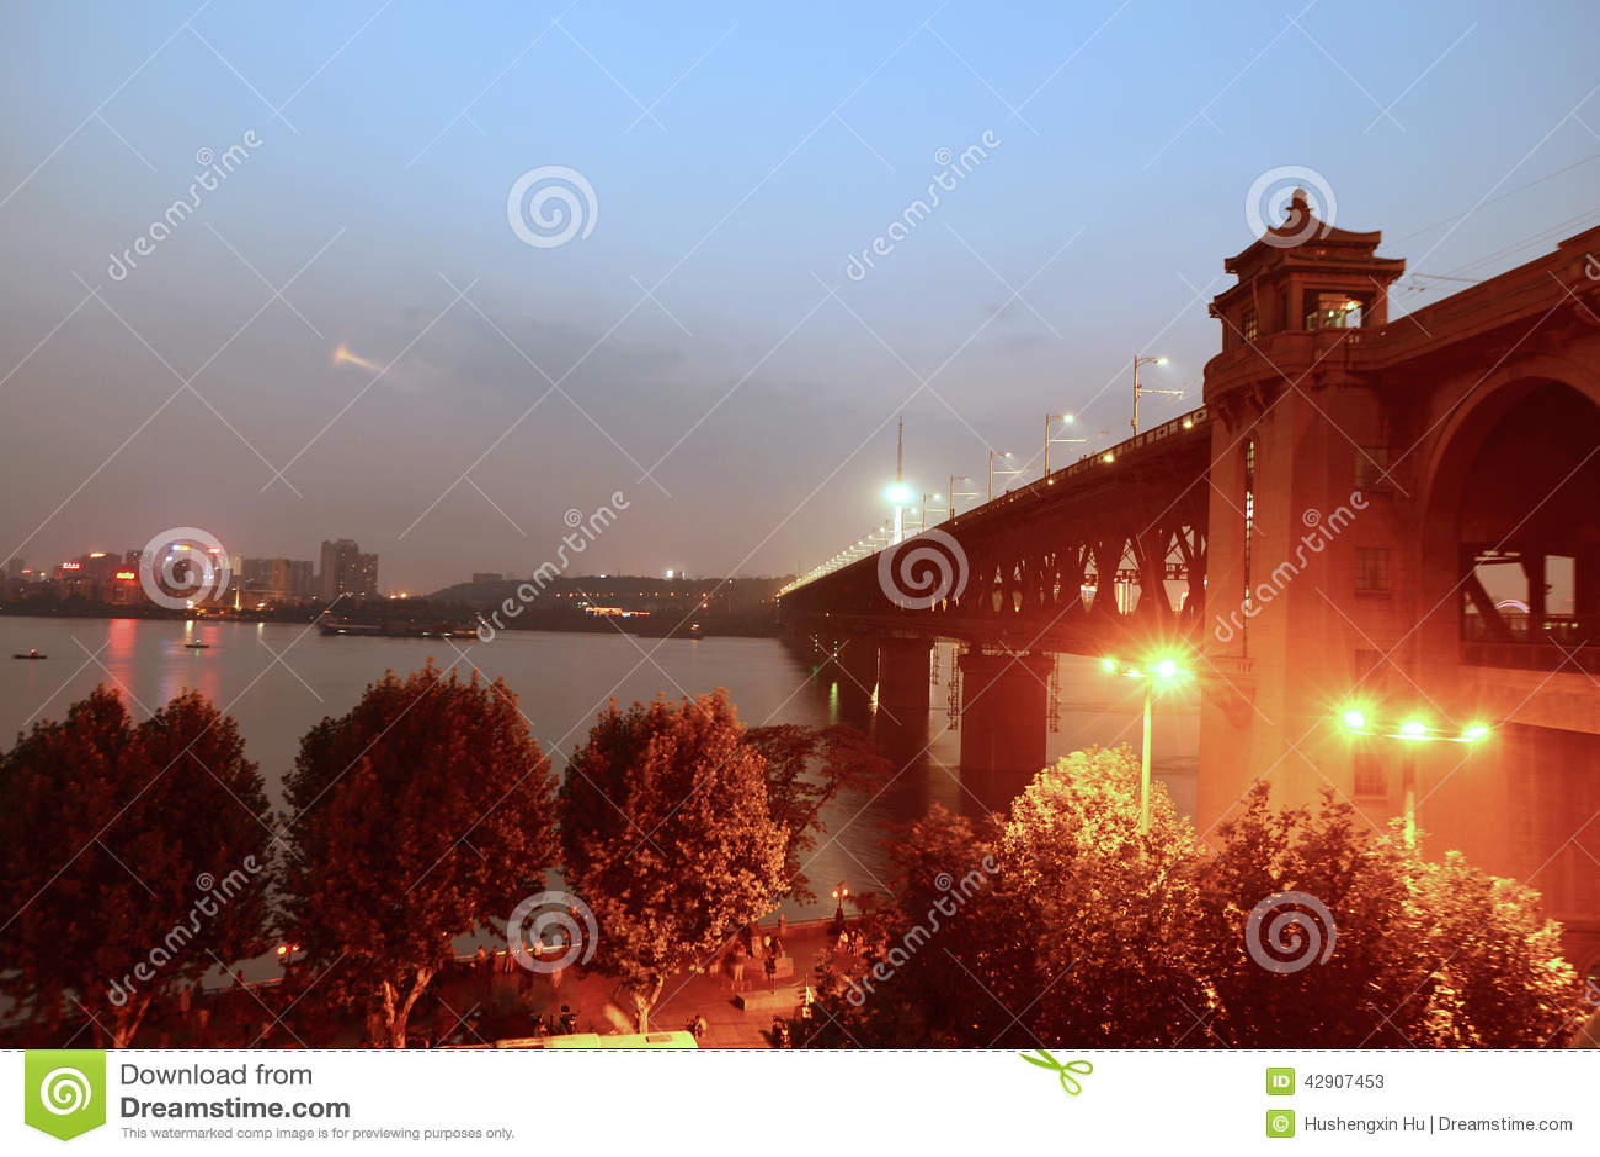 Wuhan Yangtze River bridge night